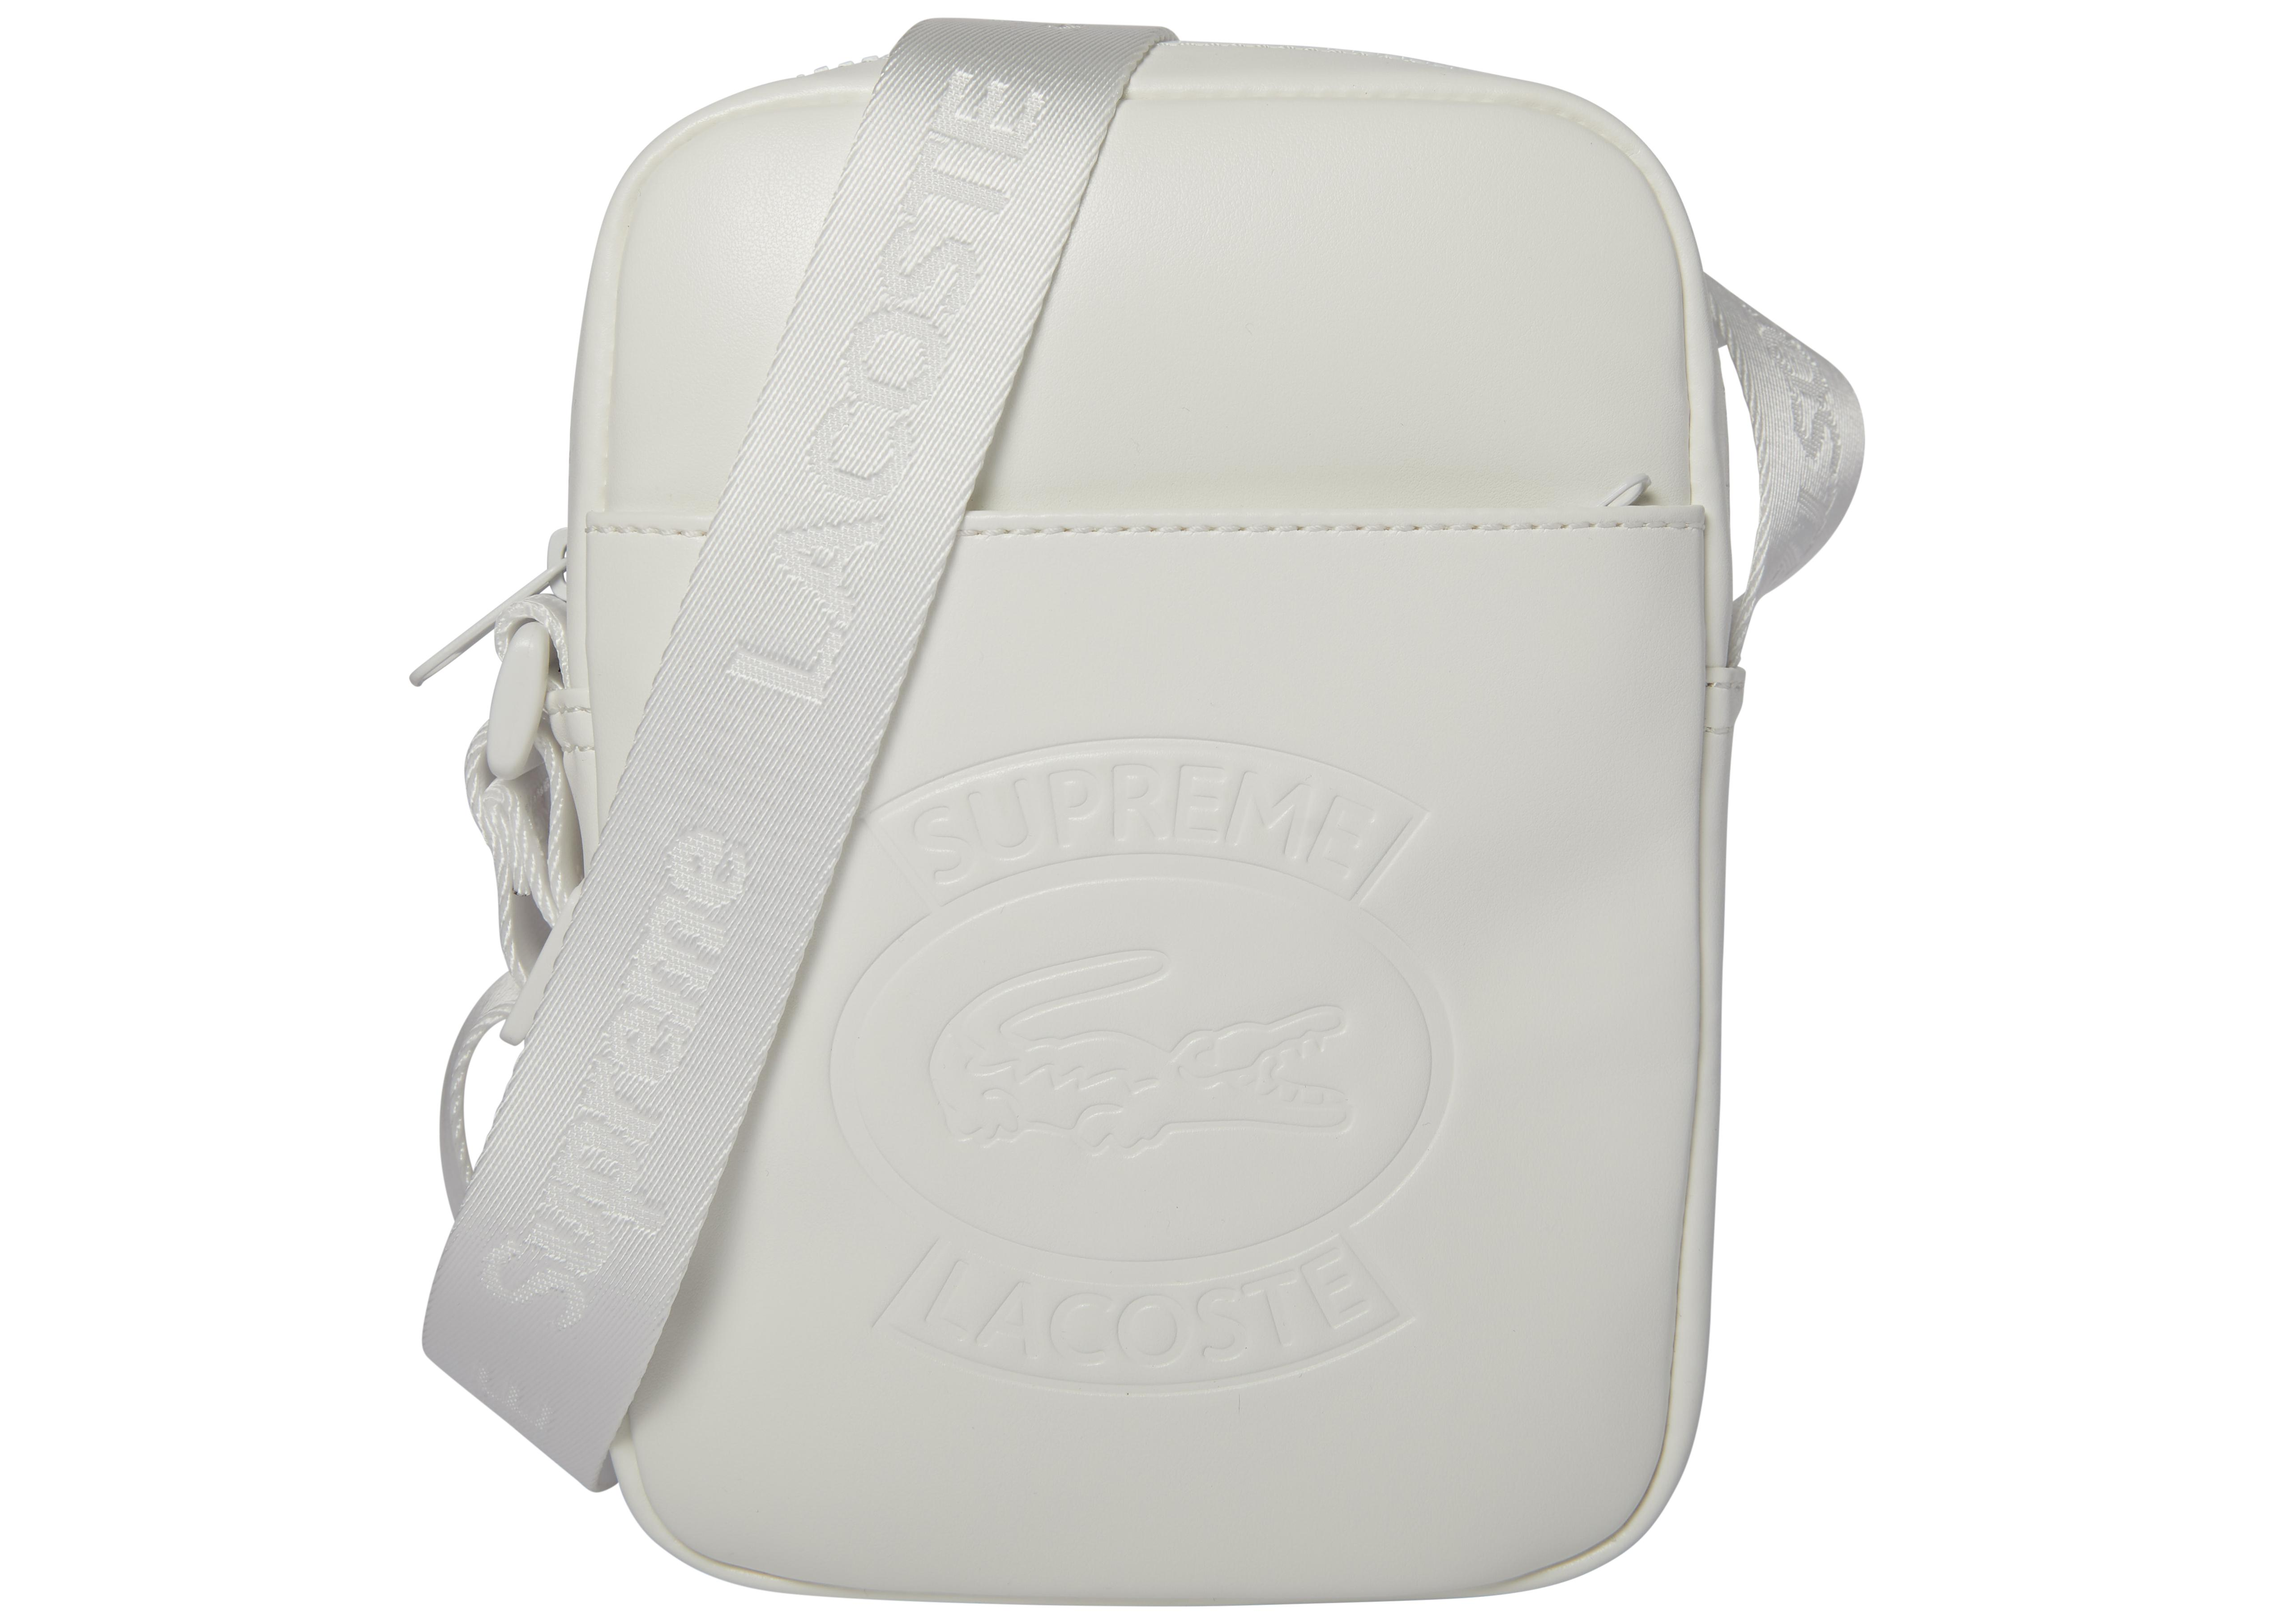 Supreme Lacoste Shoulder Bag White in White - Lyst